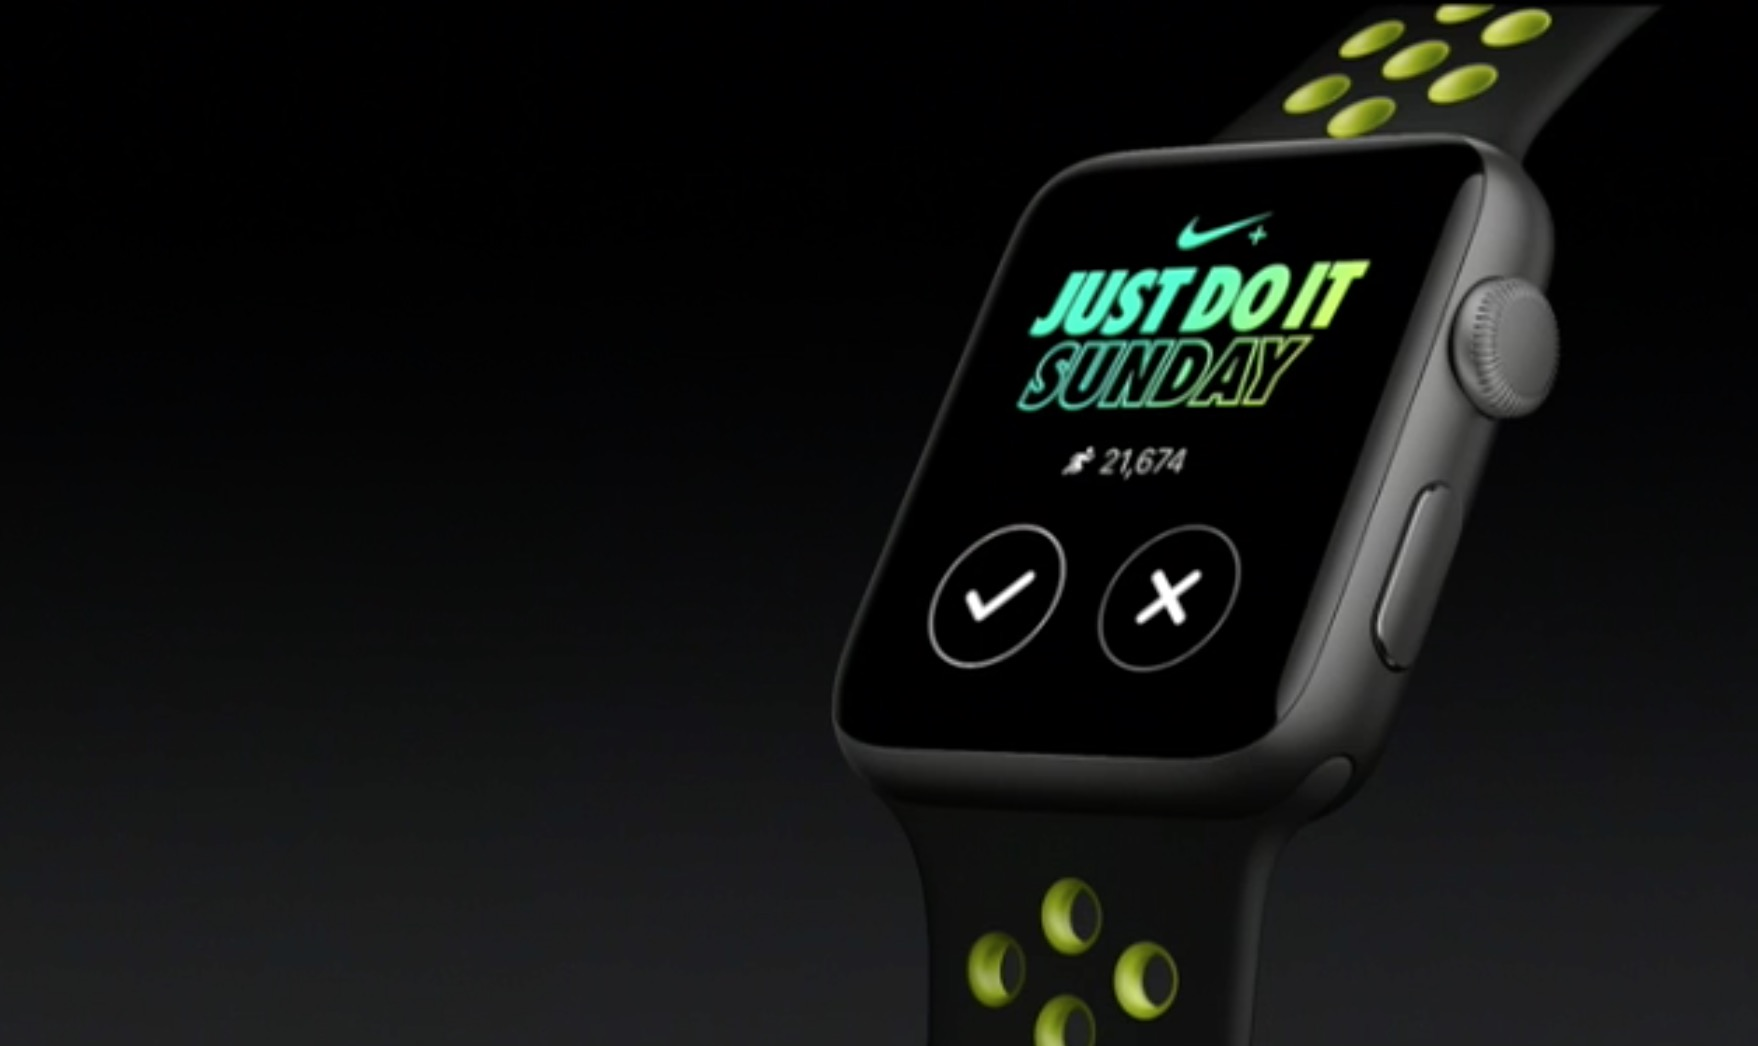 Apple Watch 2 Just Do It Sunday